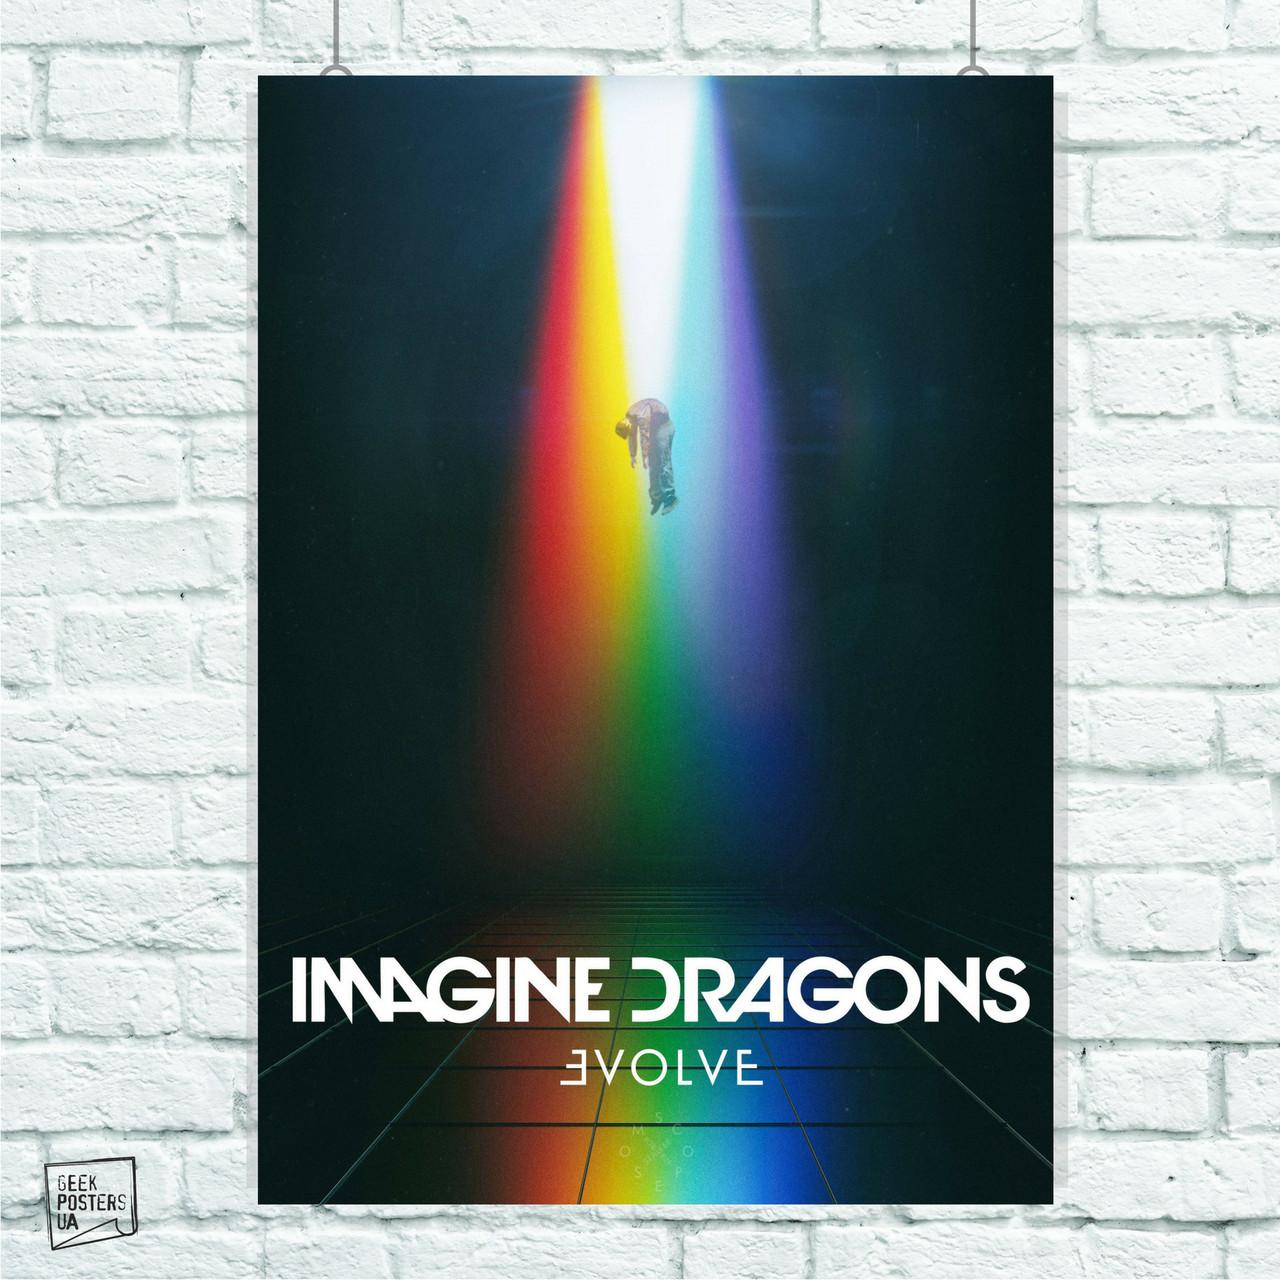 Постер Imagine Dragons (обложка, Evolve). Размер 60x42см (A2). Глянцевая бумага